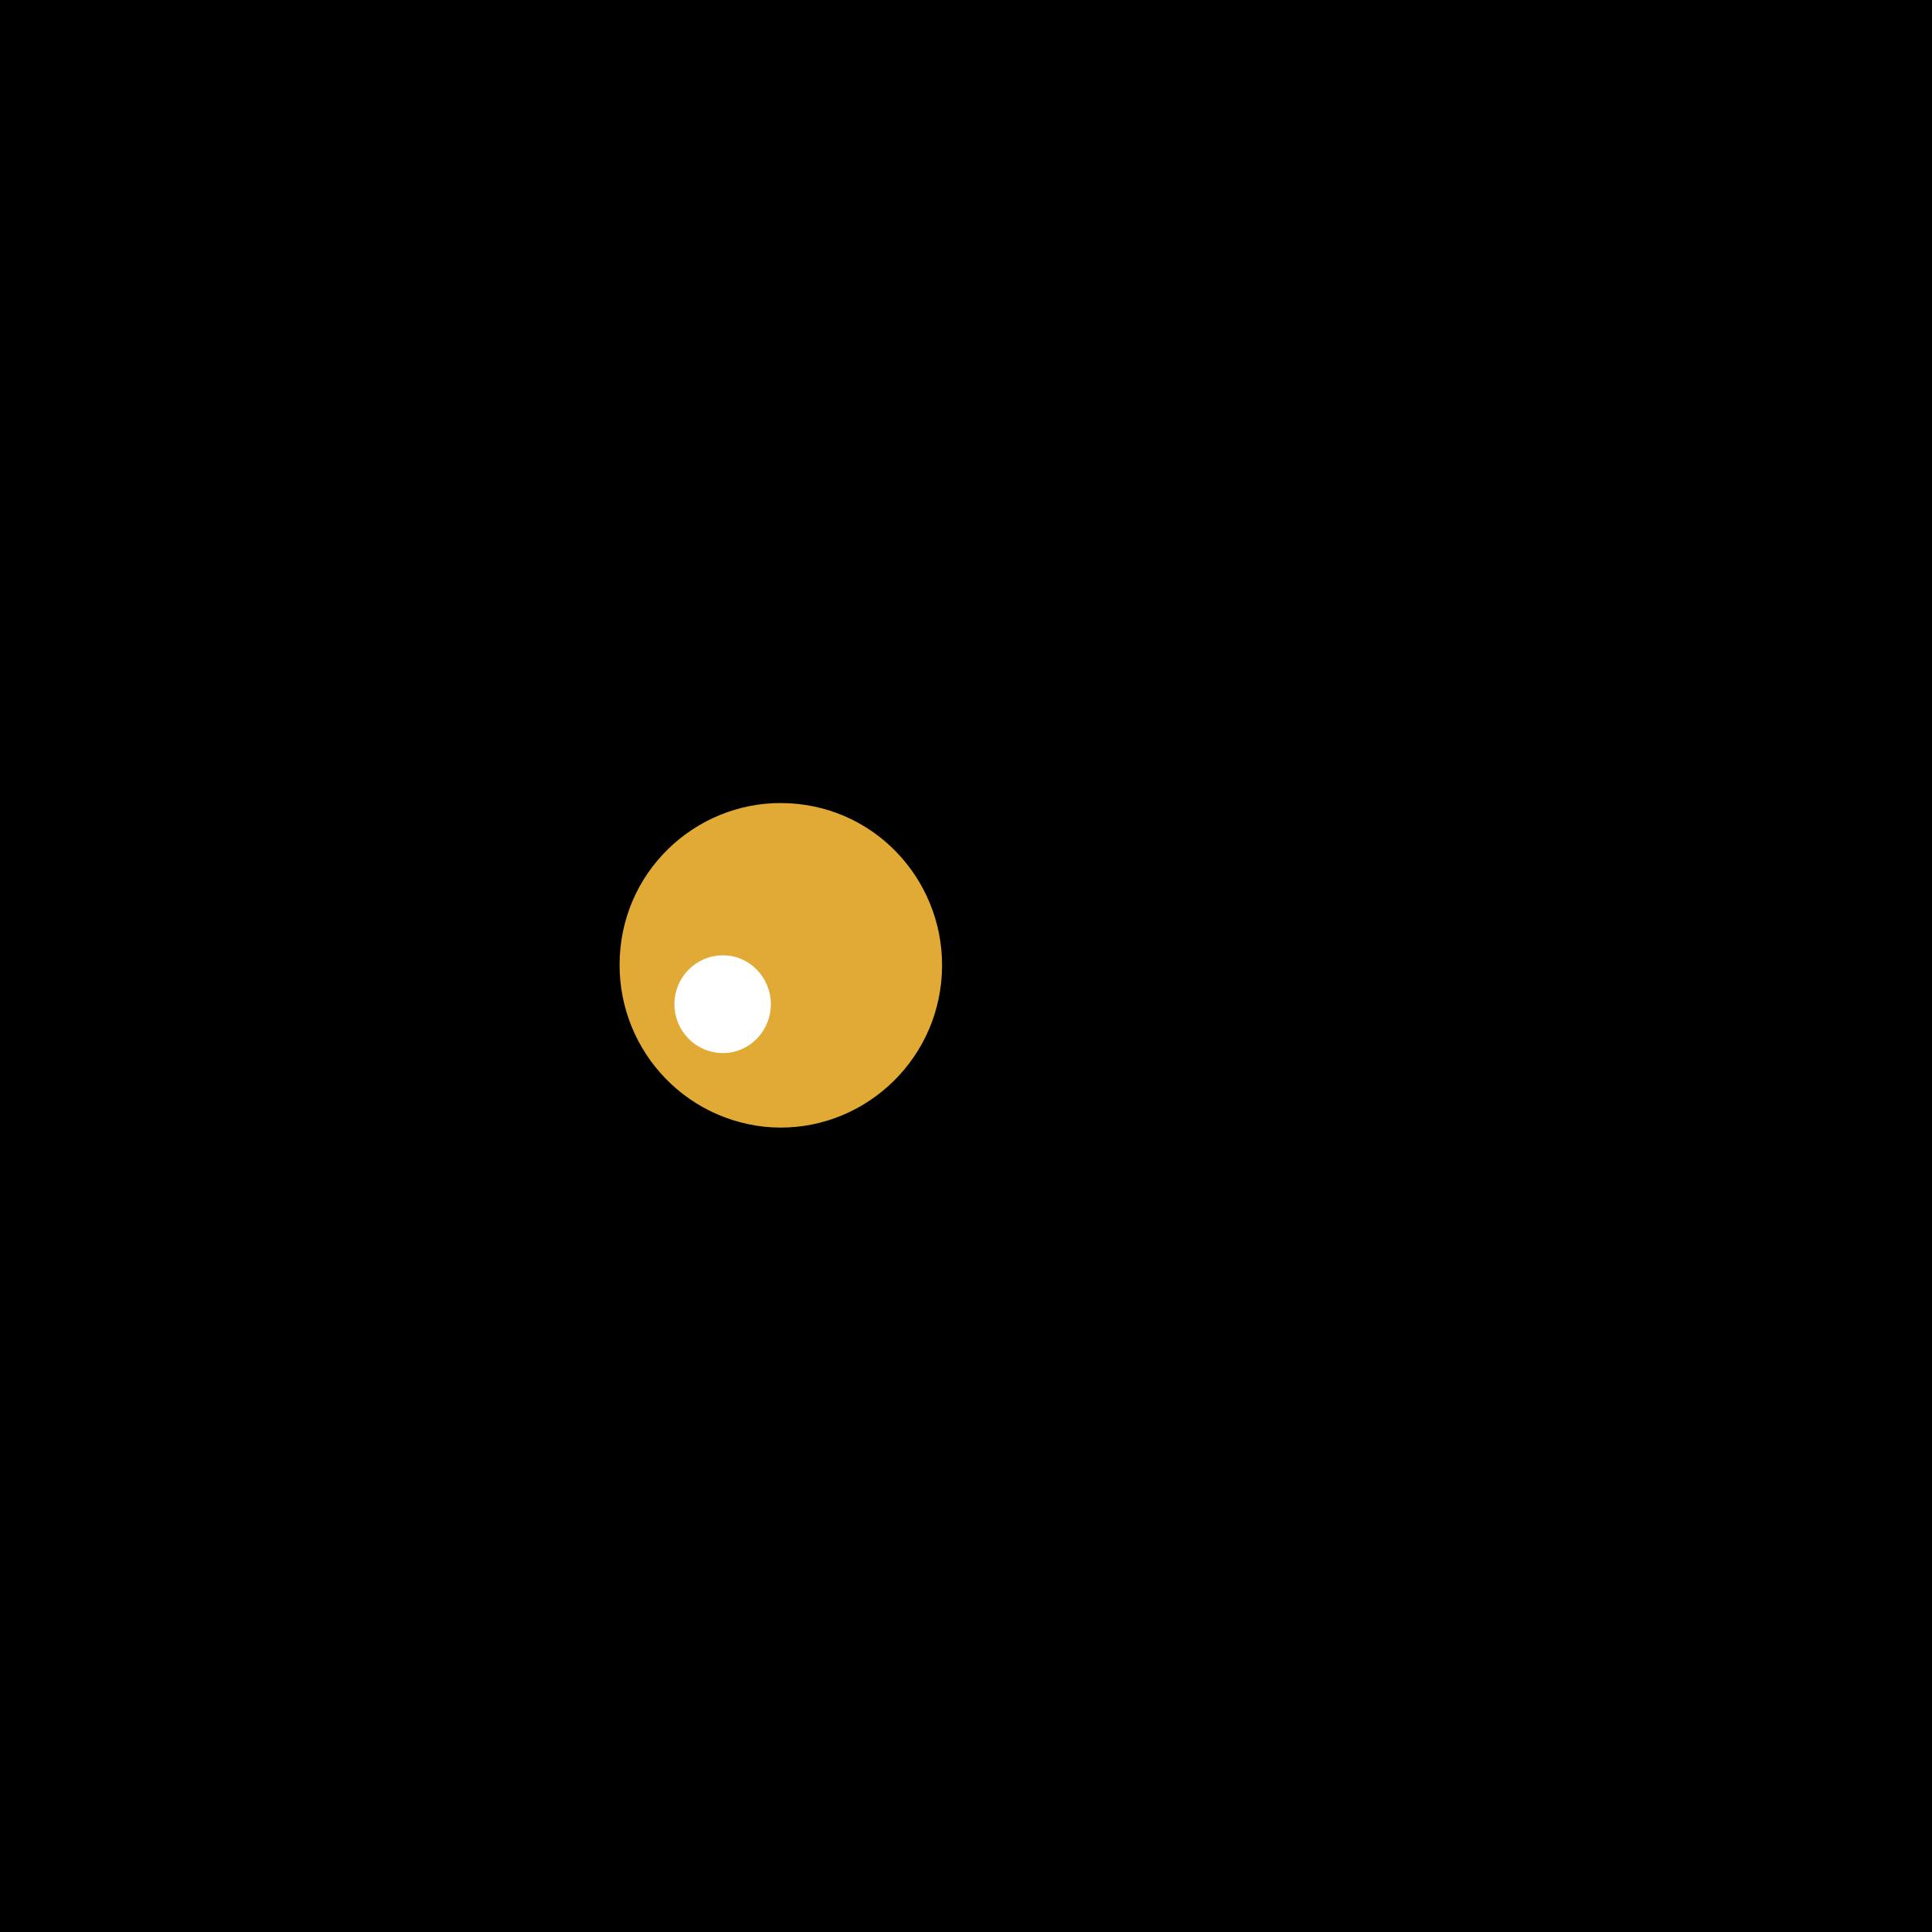 Focus Logo PNG Transparent & SVG Vector.